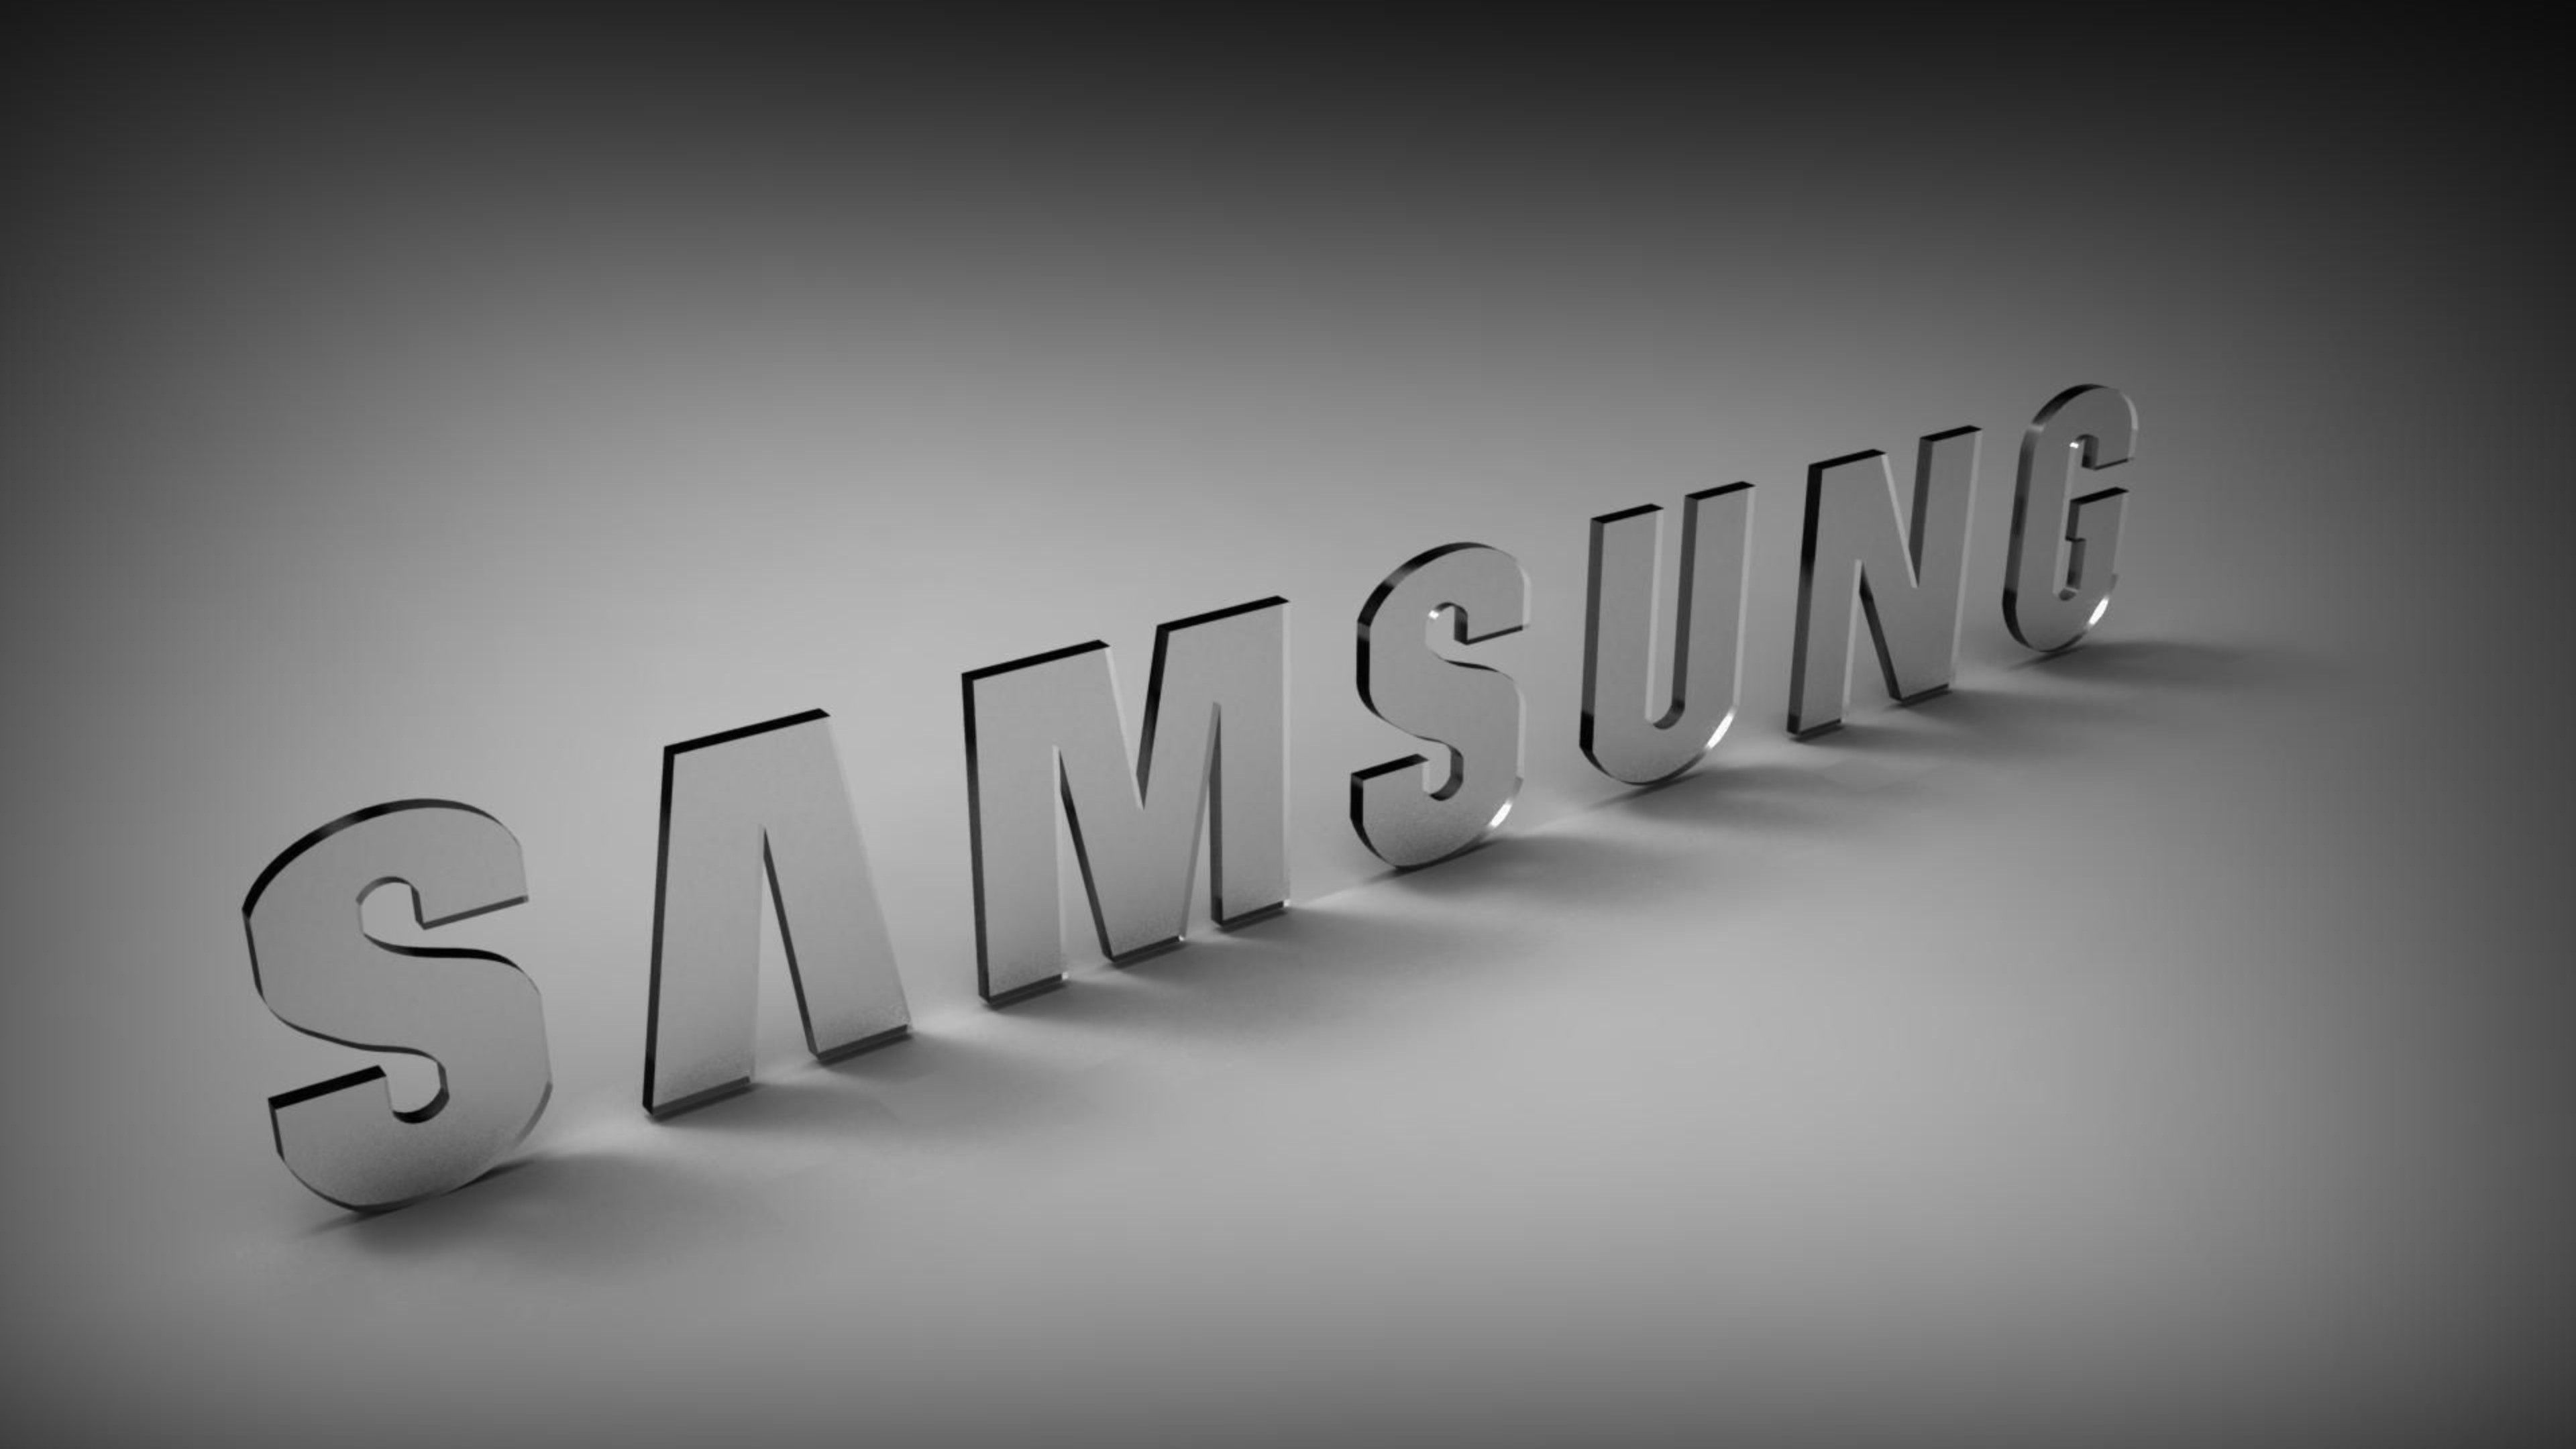 Samsung Uhd 4k Wallpapers Top Free Samsung Uhd 4k Backgrounds Wallpaperaccess